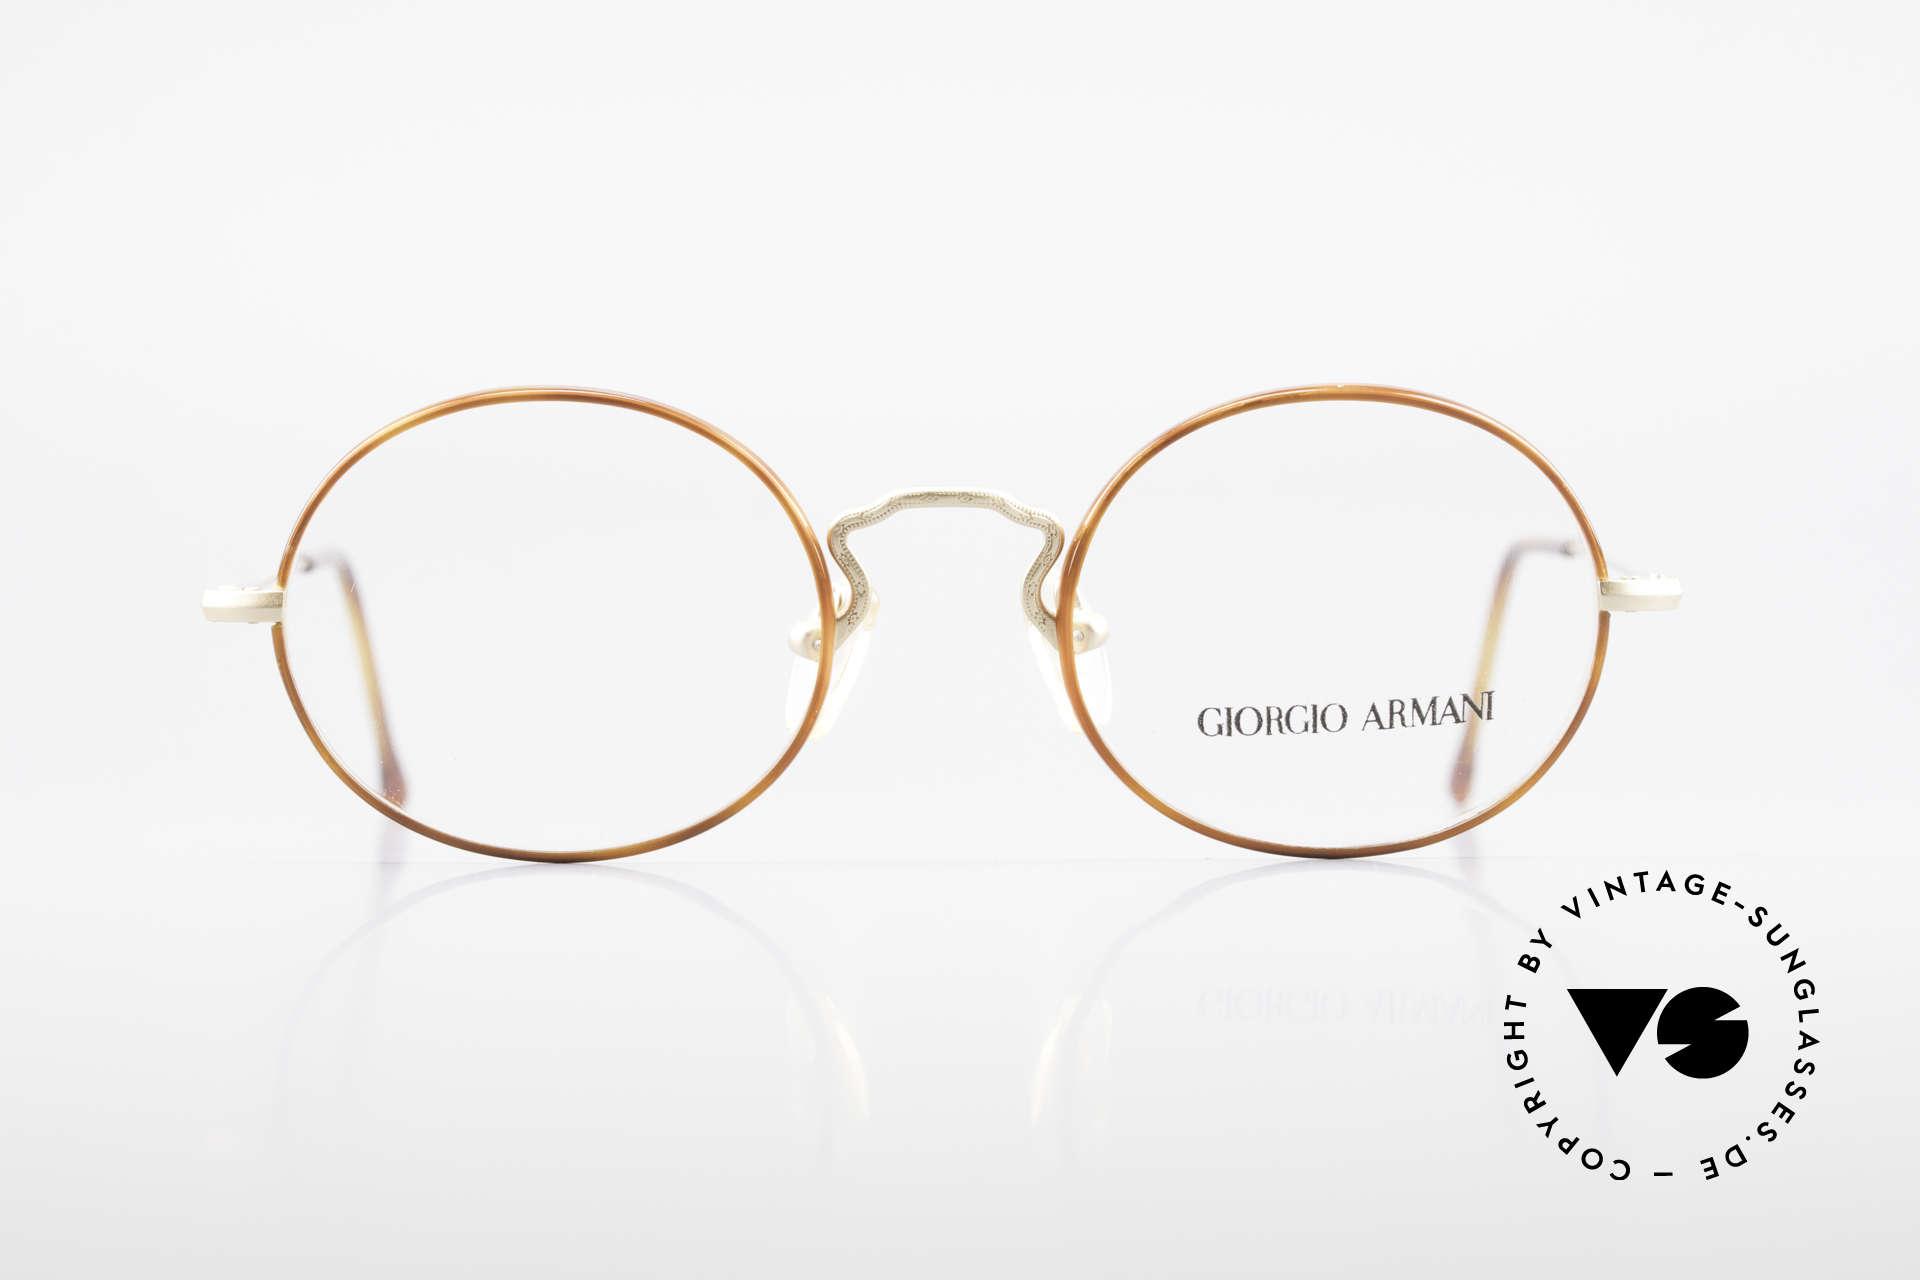 Giorgio Armani 247 90's Oval Eyeglasses No Retro, small oval-round frame design' - a timeless classic!, Made for Men and Women